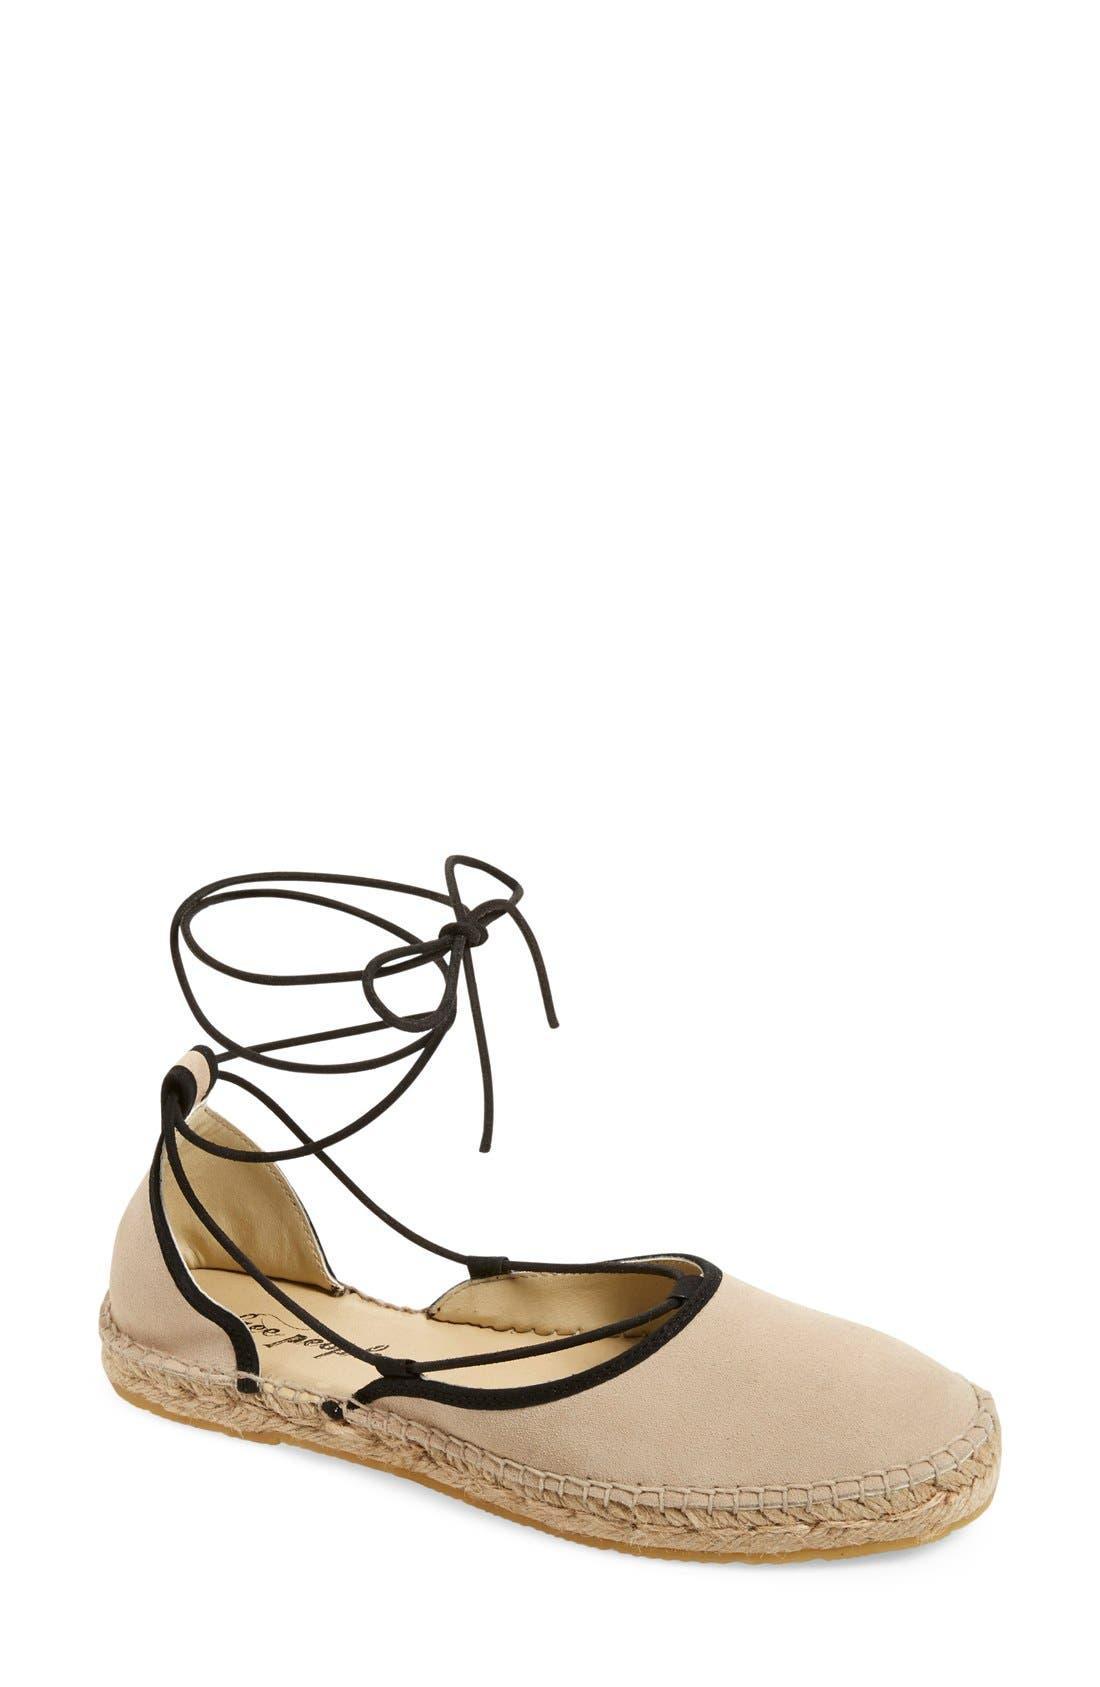 Main Image - Free People 'Marina' Espadrille Sandal (Women)